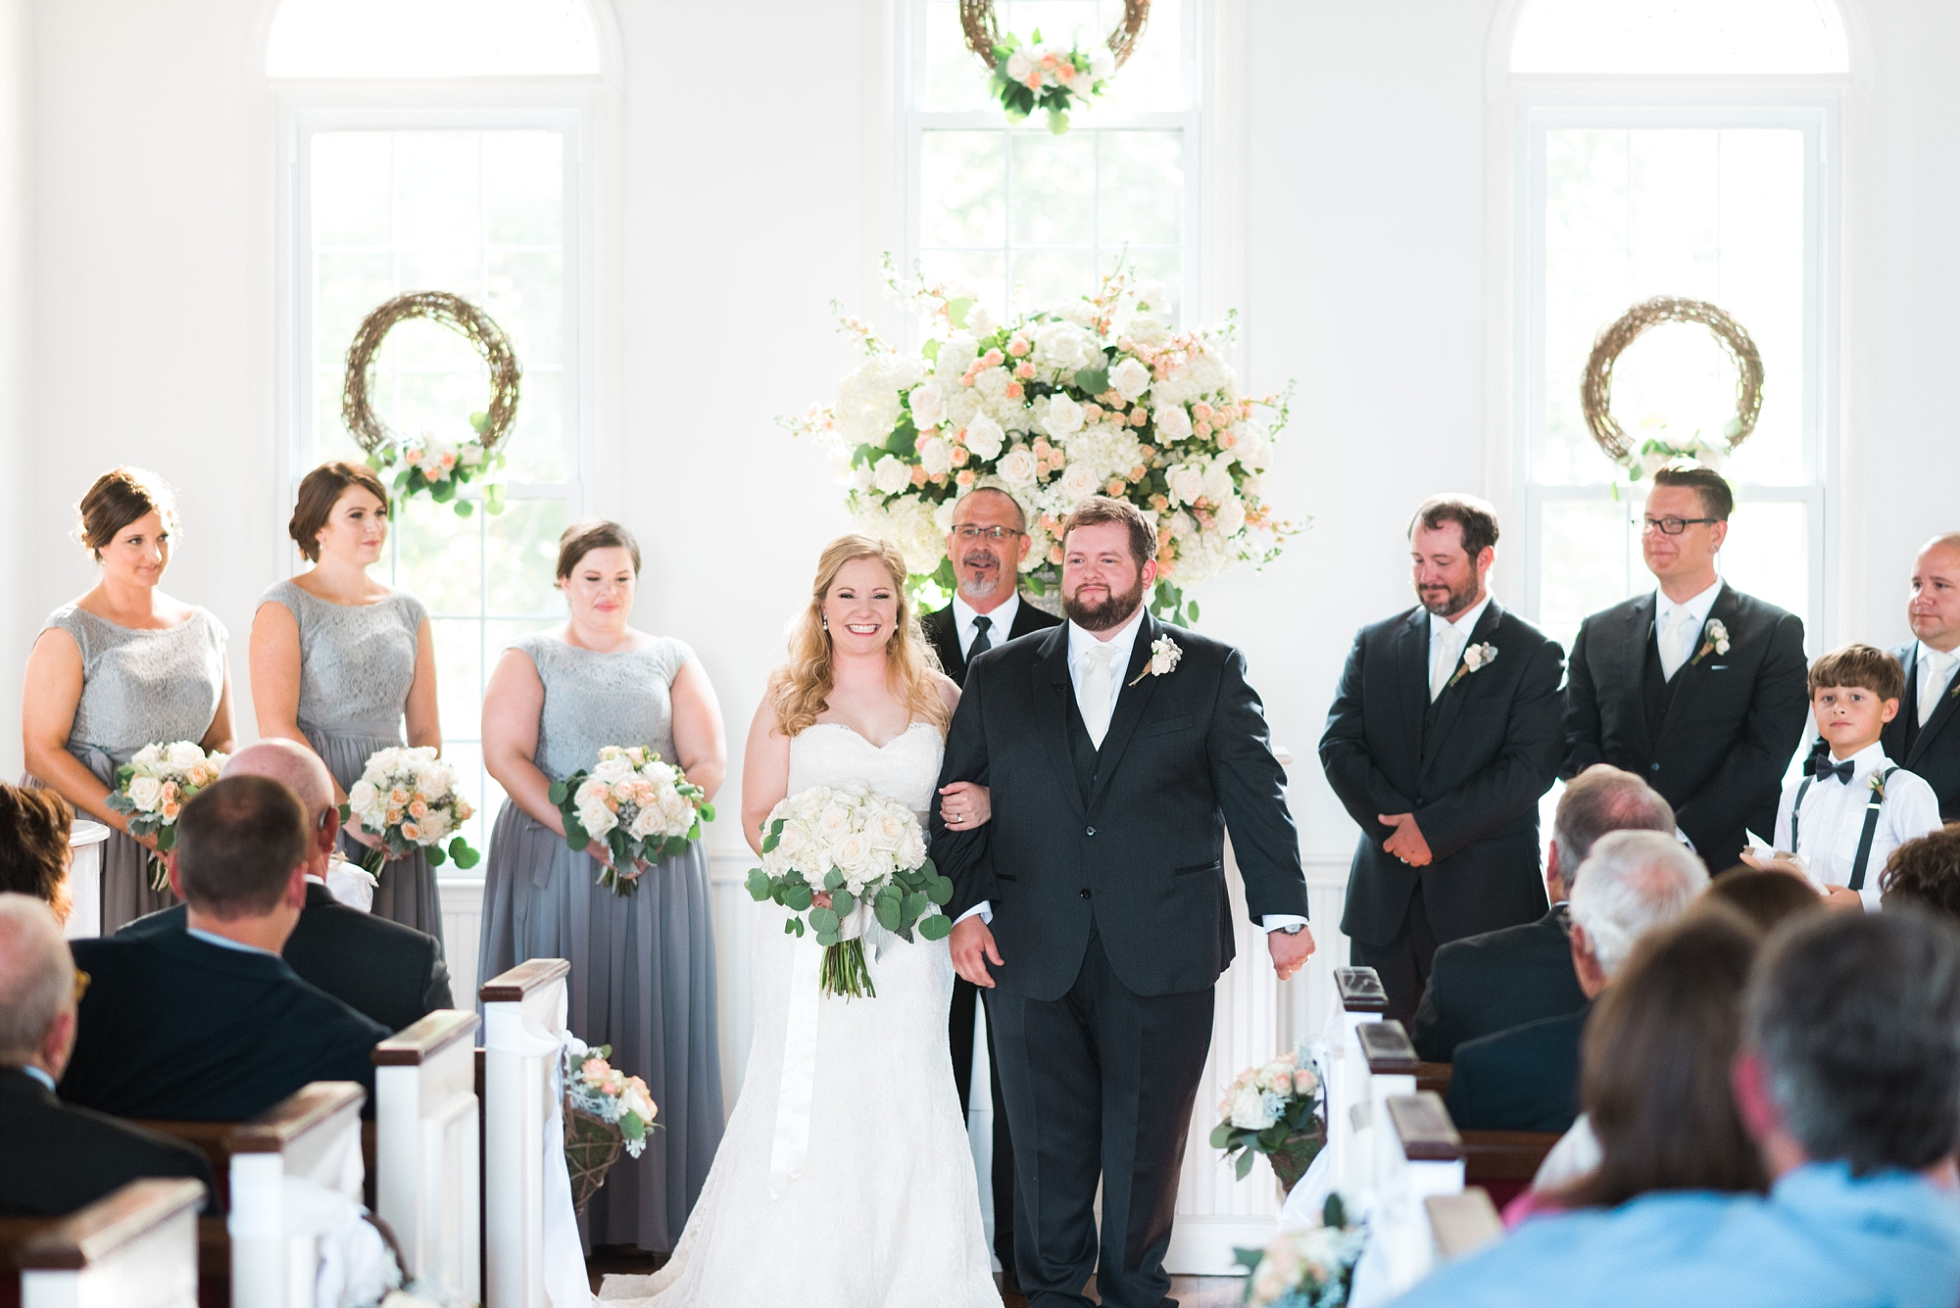 Ceremony | Kyle & Erin | Scarbrough Wedding | Children's Harbor | Laura Wilkerson Photography